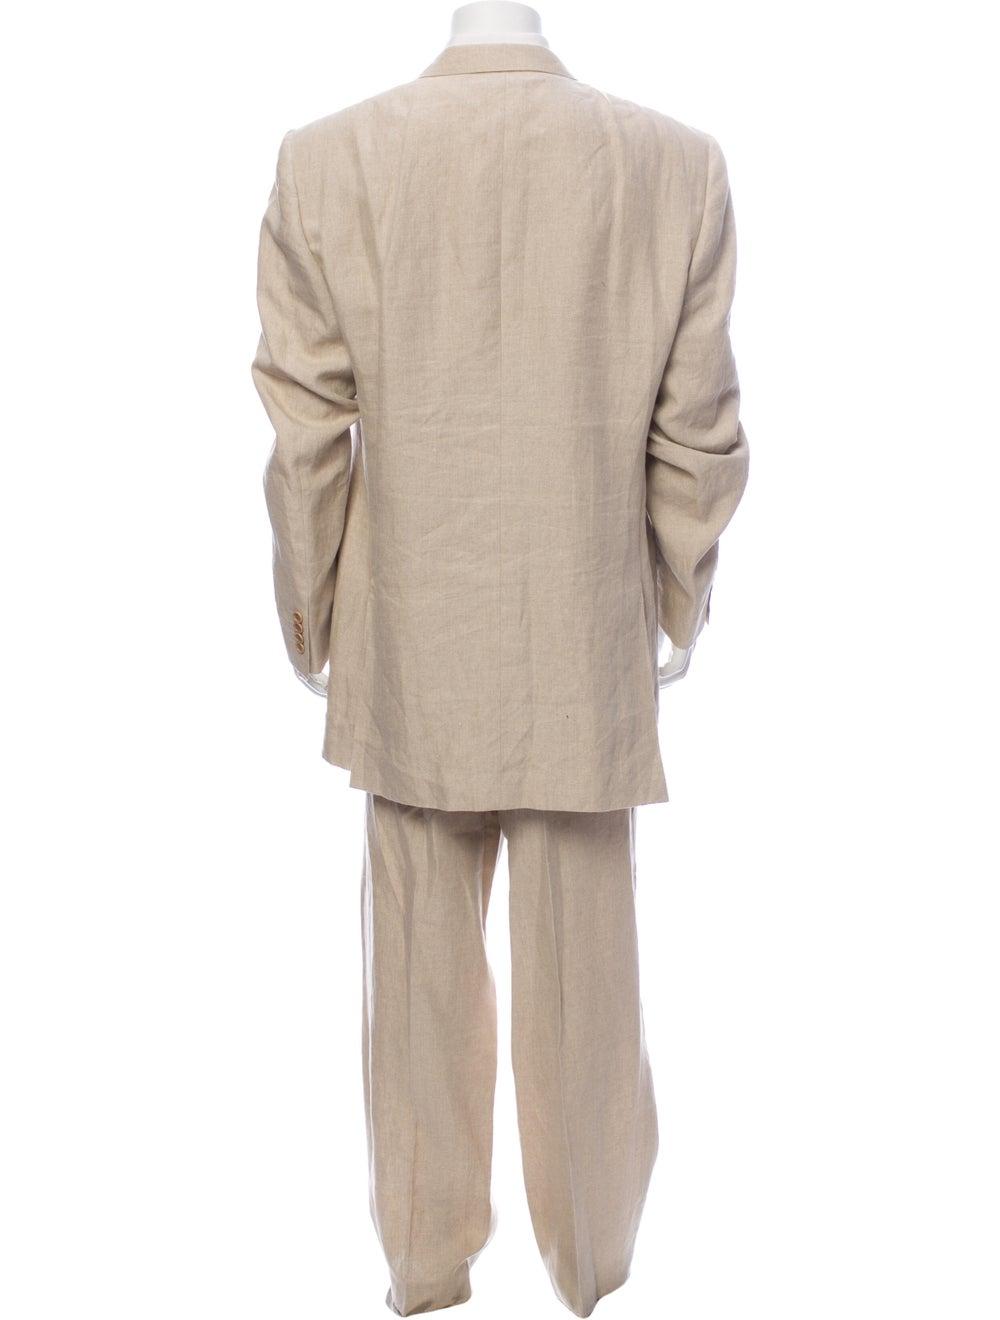 Canali Linen Two-Piece Suit - image 3